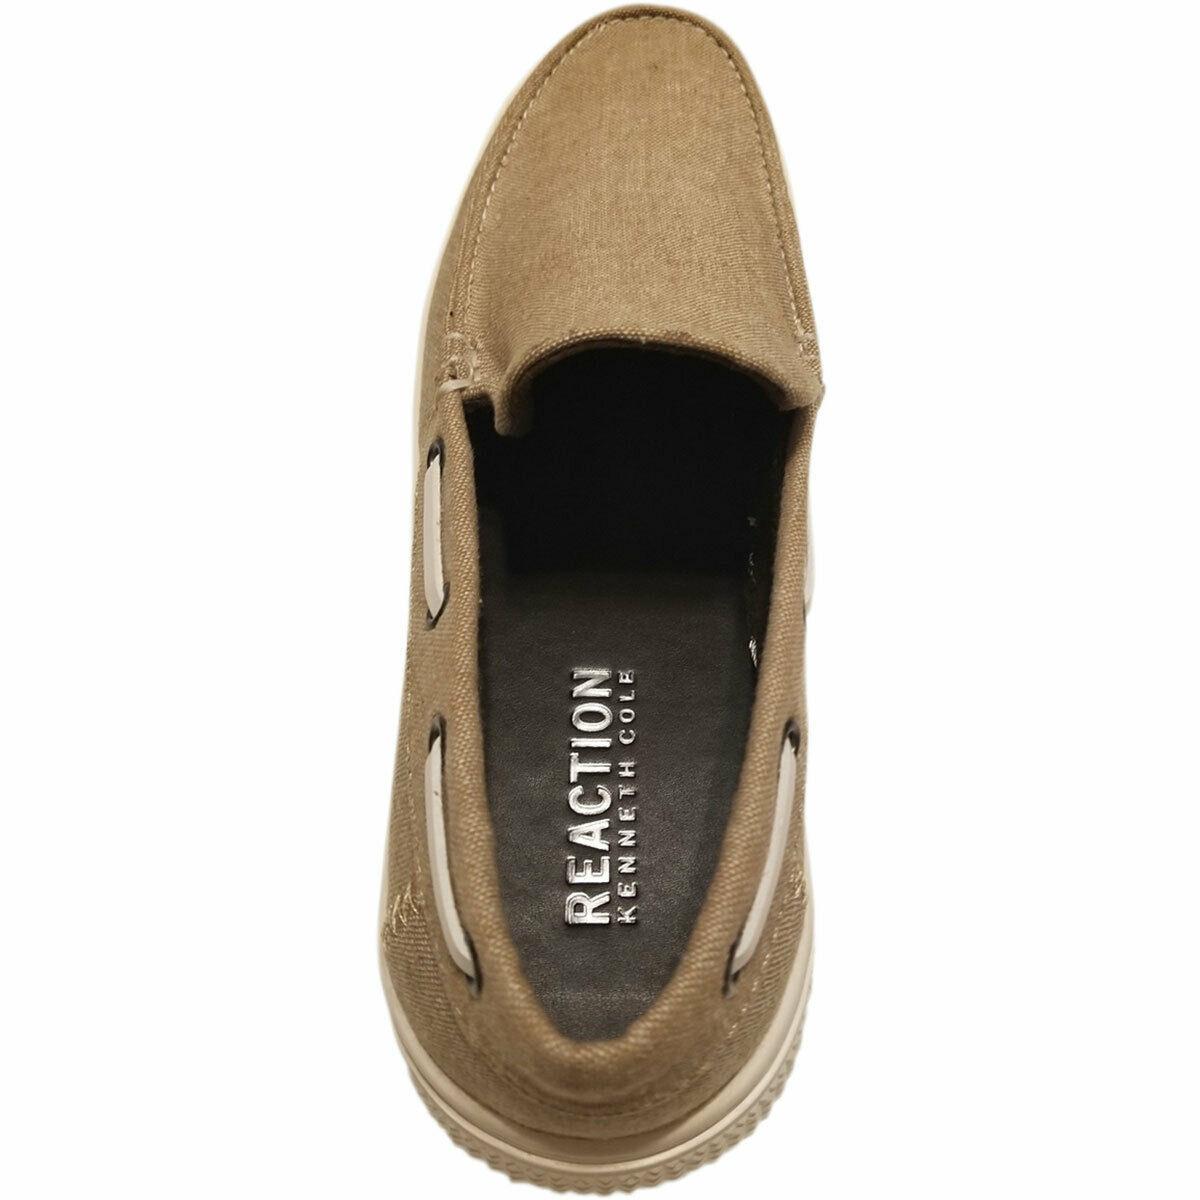 Kenneth Cole Reaction Men's Ankir Canvas Slip-on Boat Shoes Beige Sand 9.5 M ... image 6